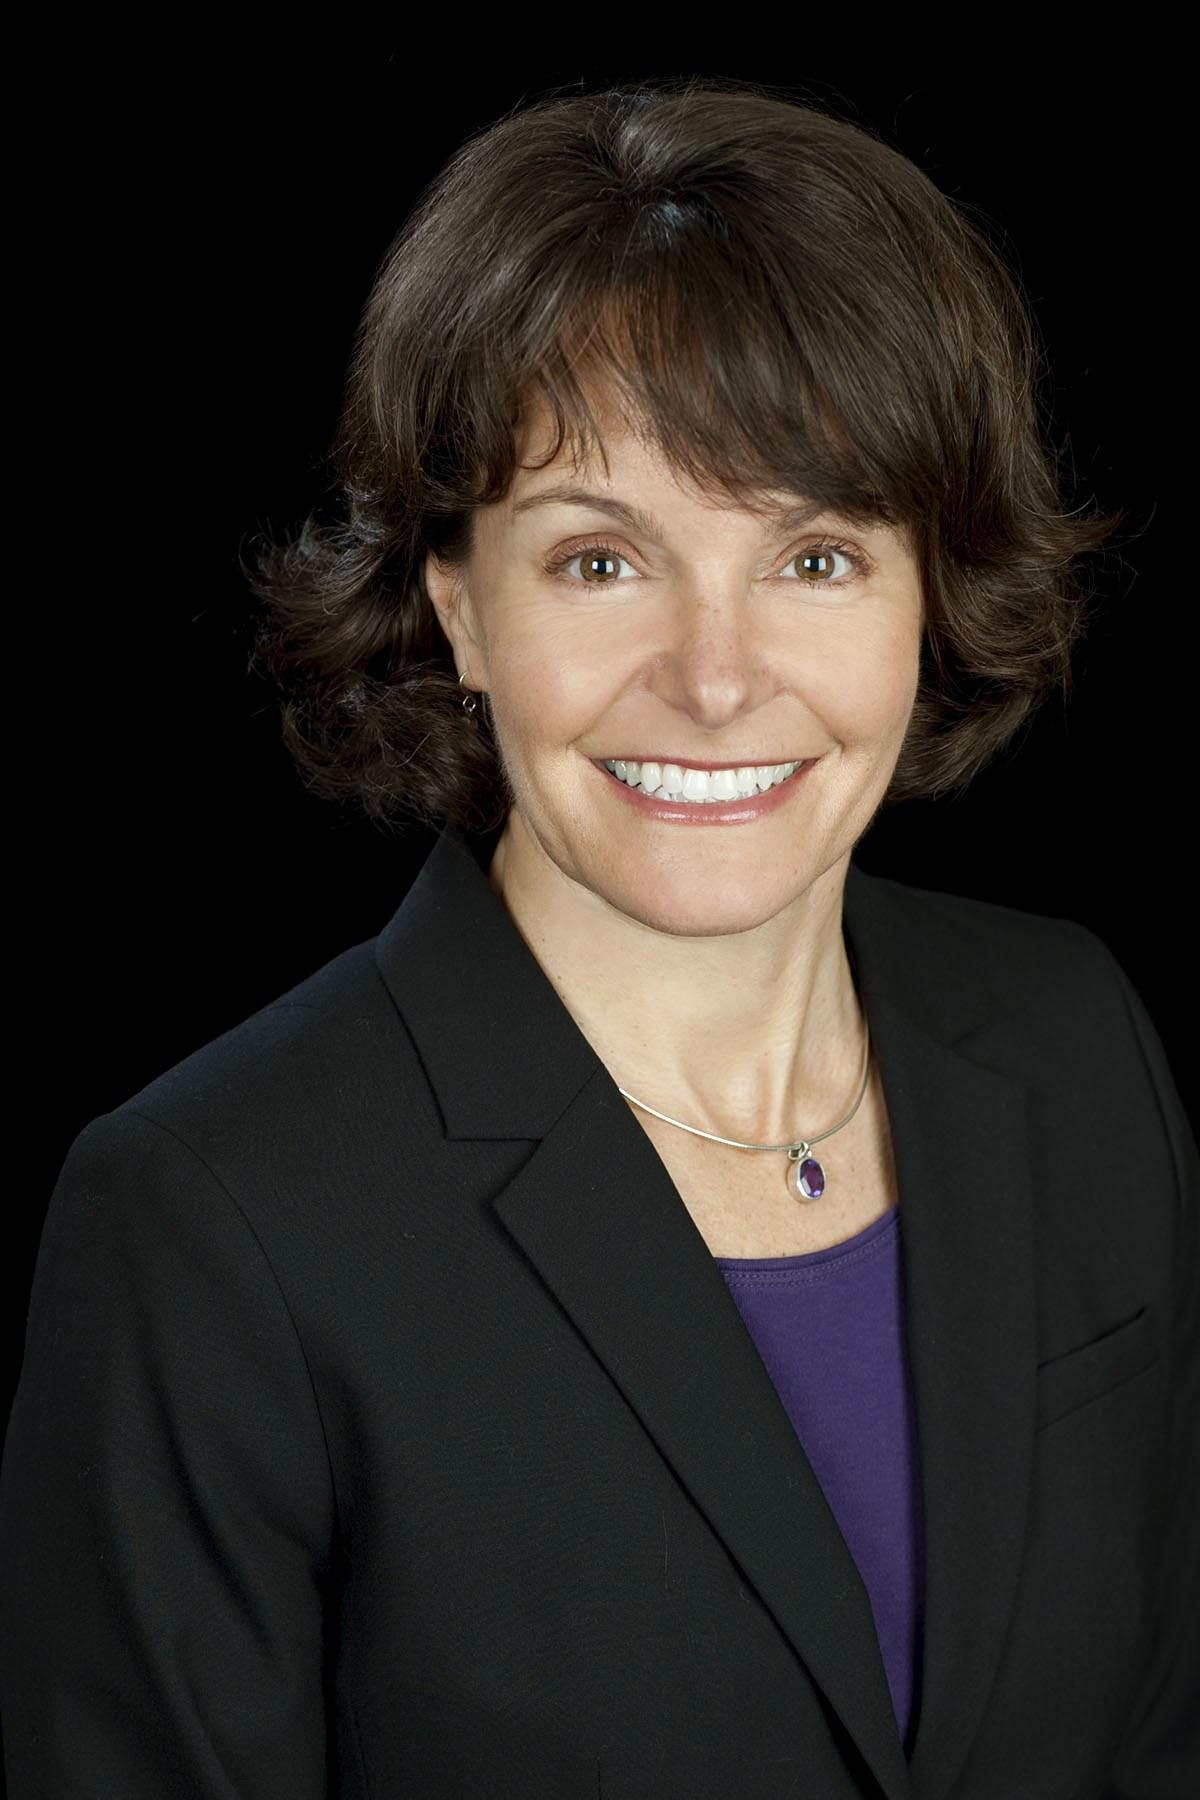 Carole Hakstian